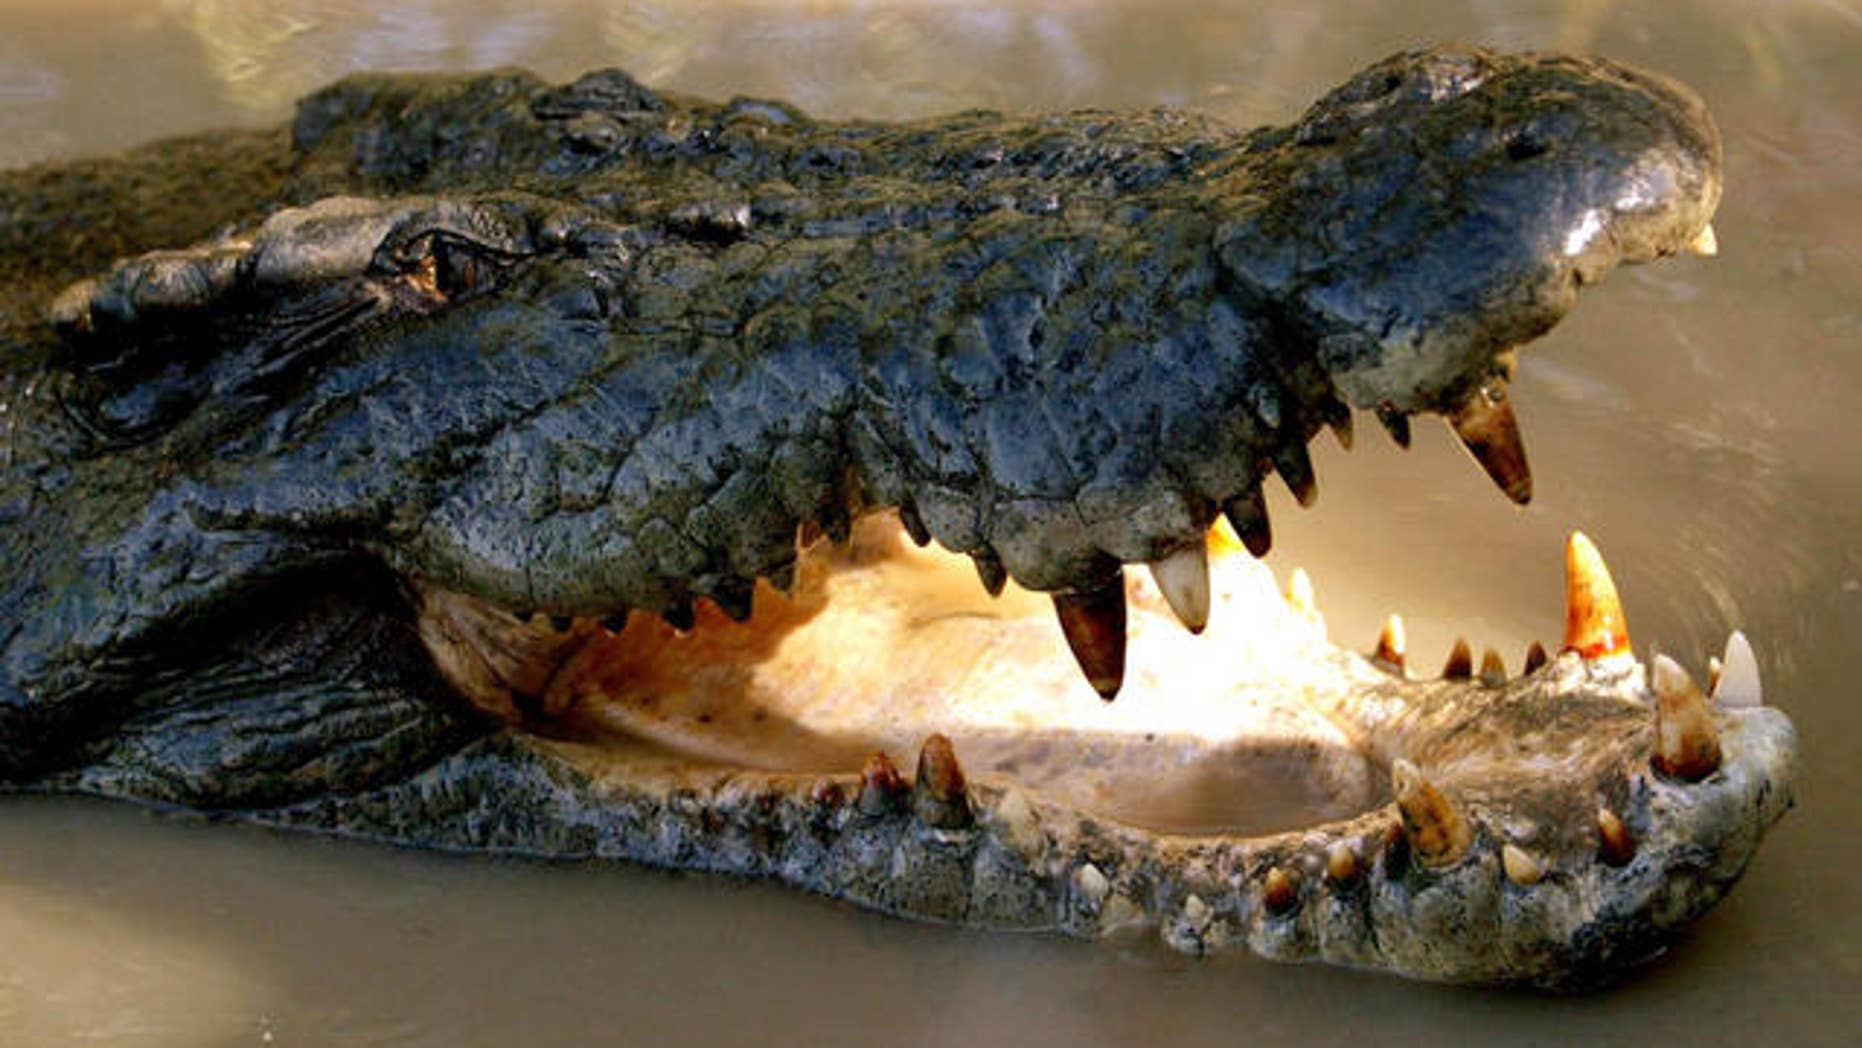 FILE photo of saltwater crocodile in Adelaide River, Australia.